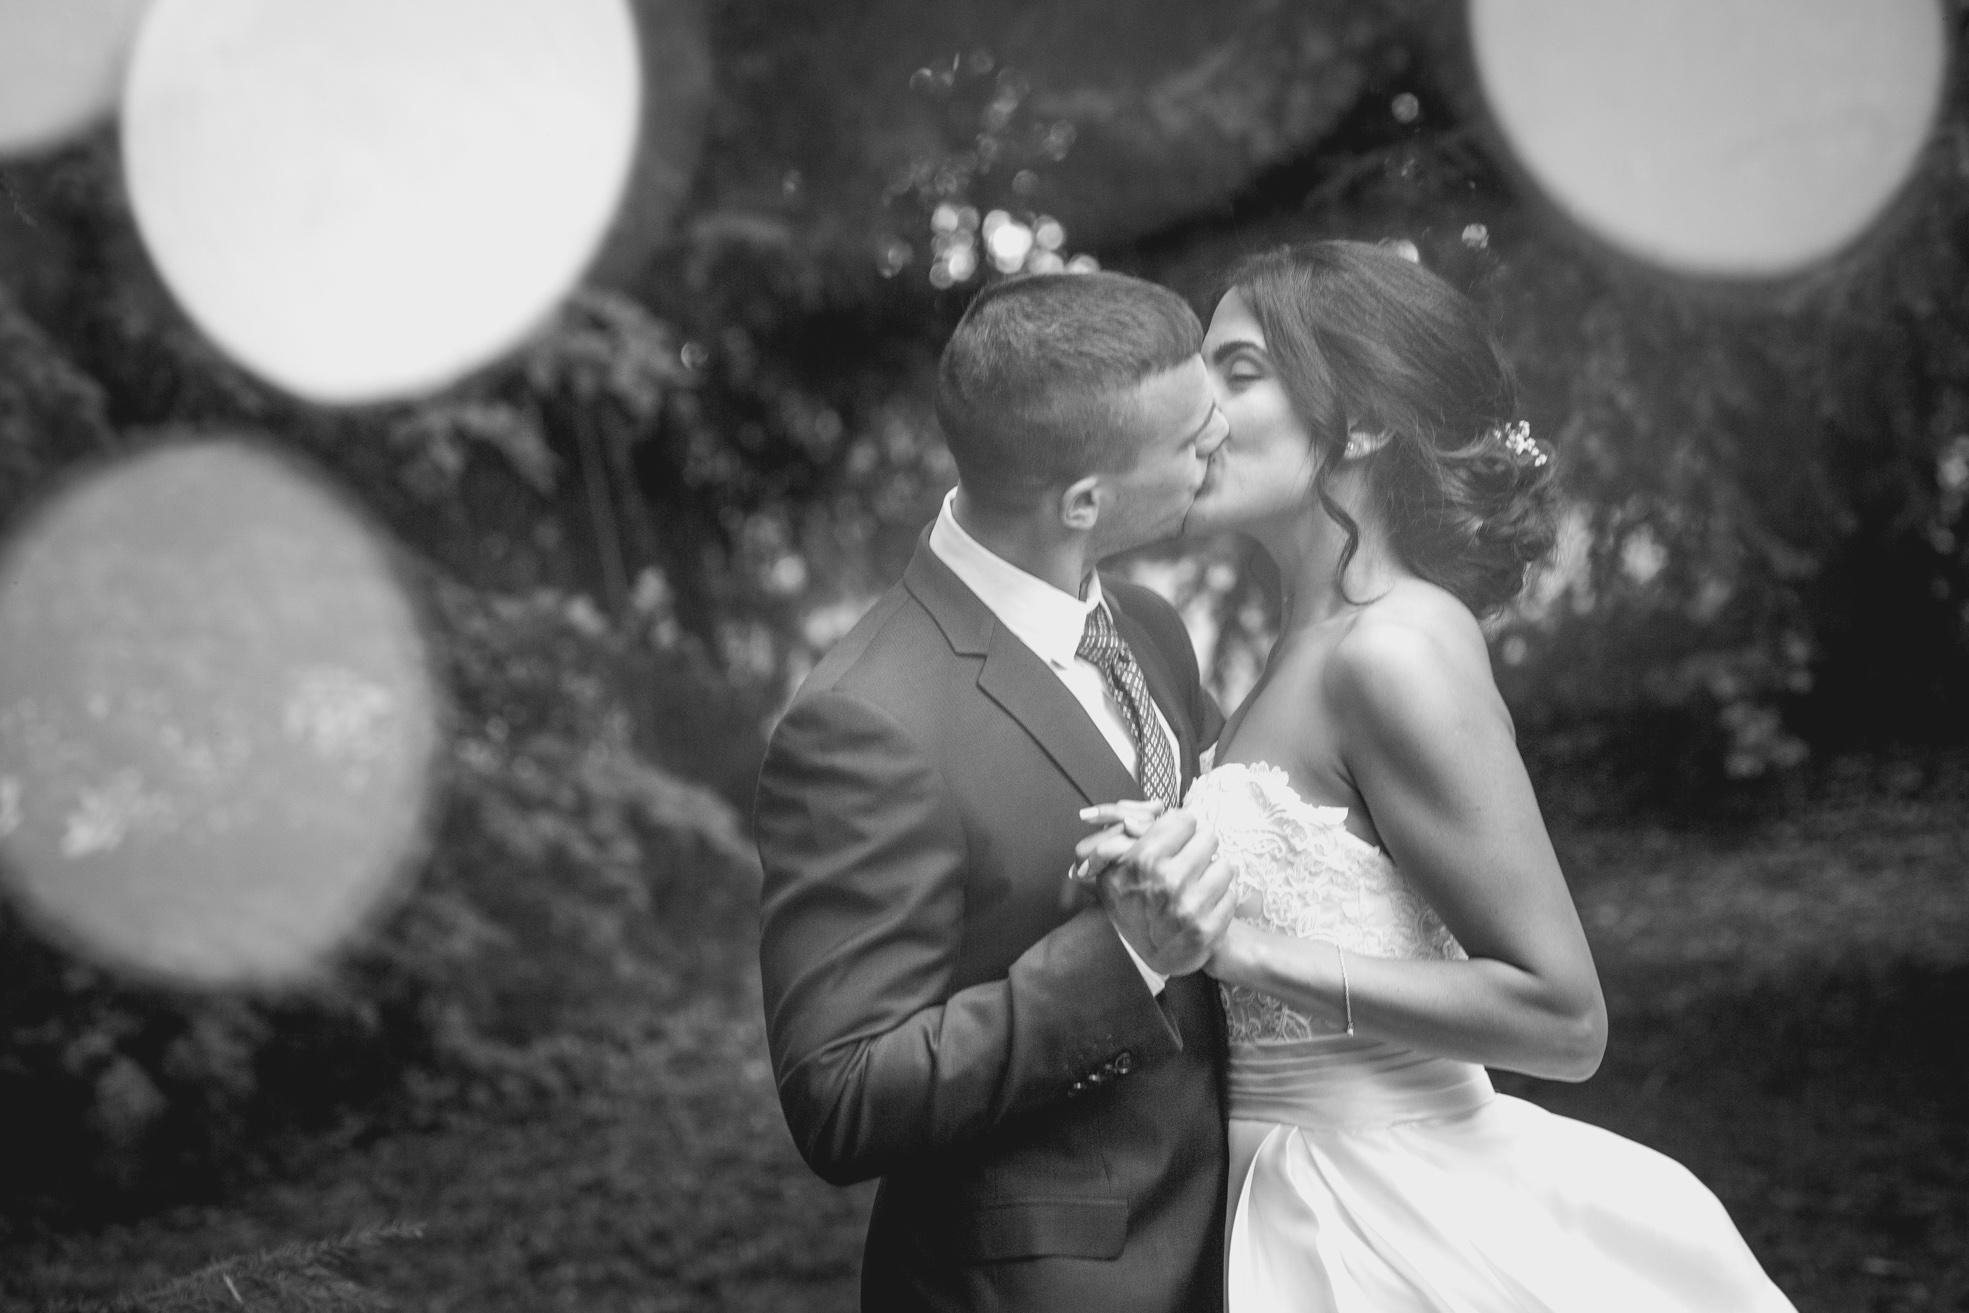 photographe mariage yvelines, photographe de mariage, jean-baptiste Chauvin Photographe